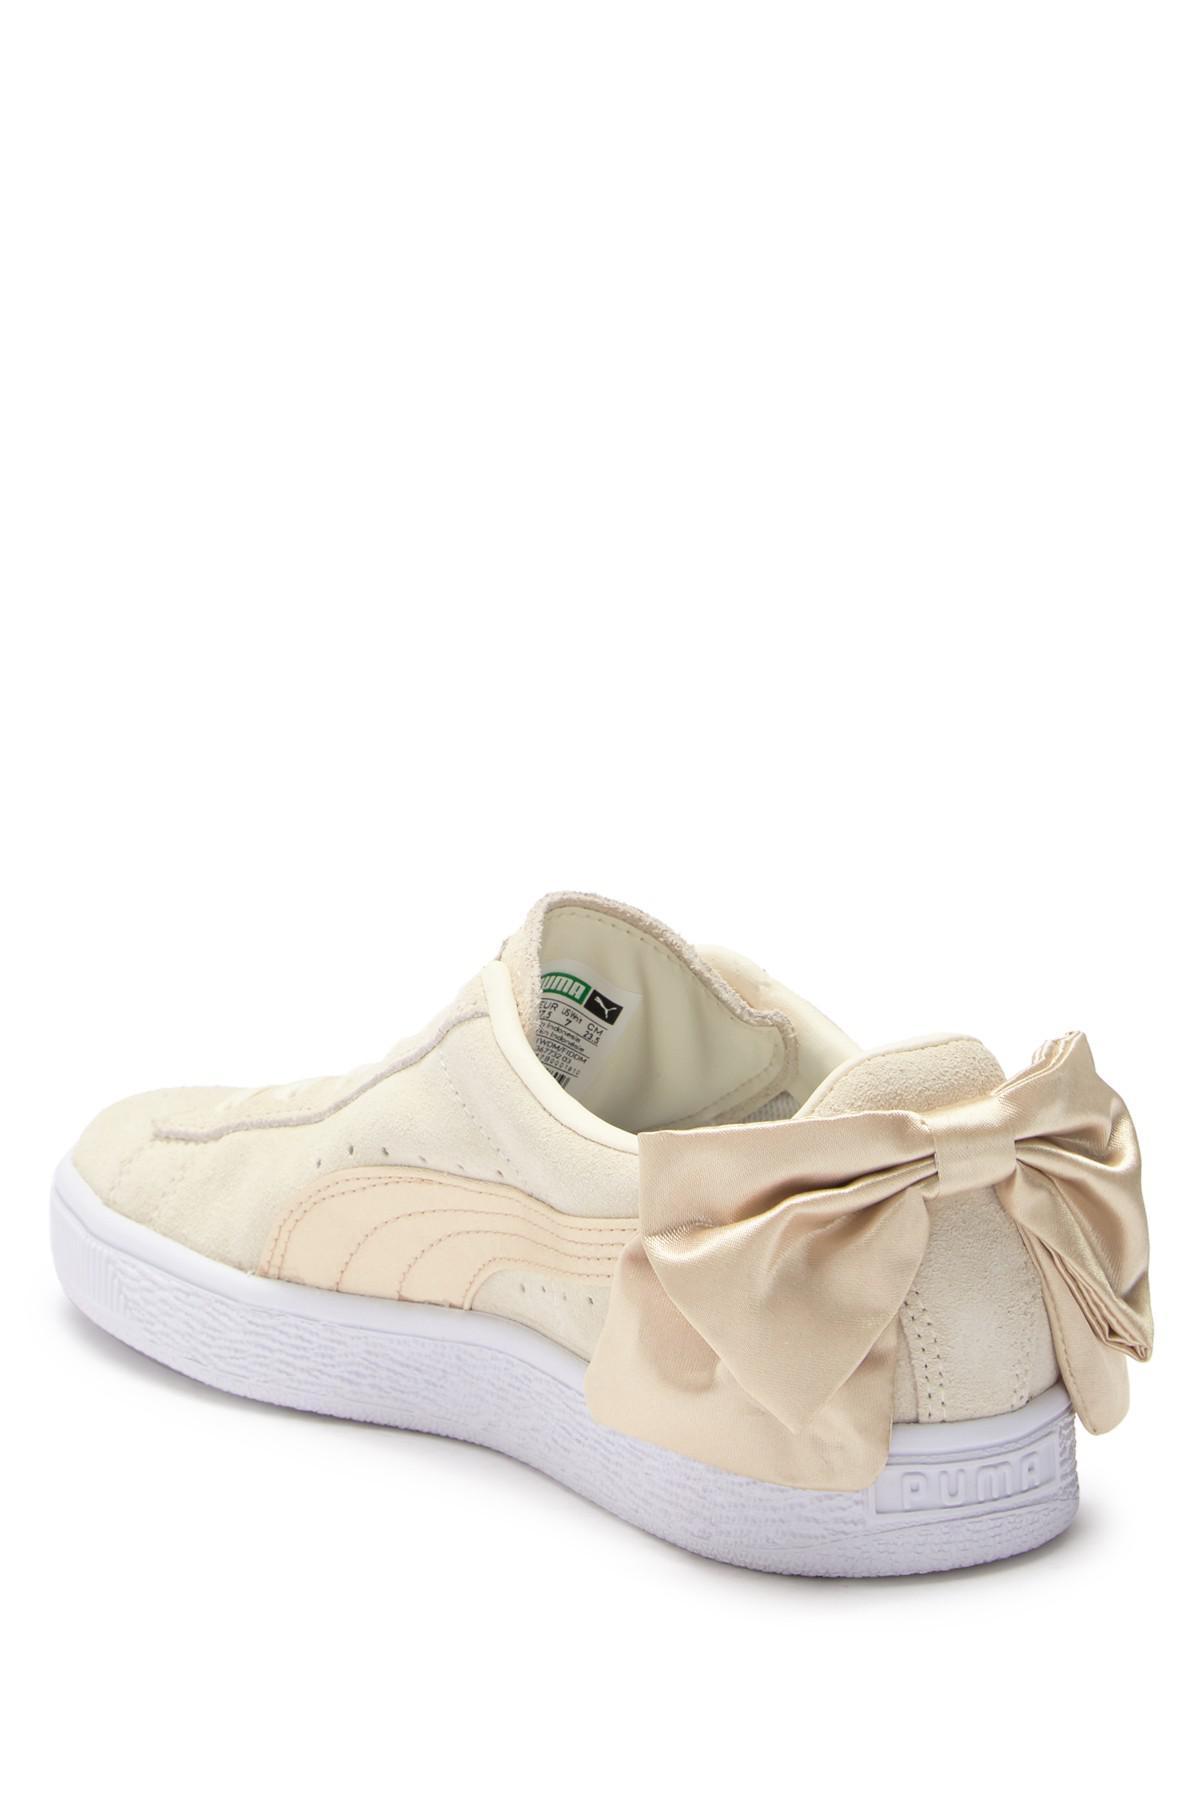 e5ff19f3df8 PUMA - White Suede Bow Varsity Sneaker - Lyst. View fullscreen